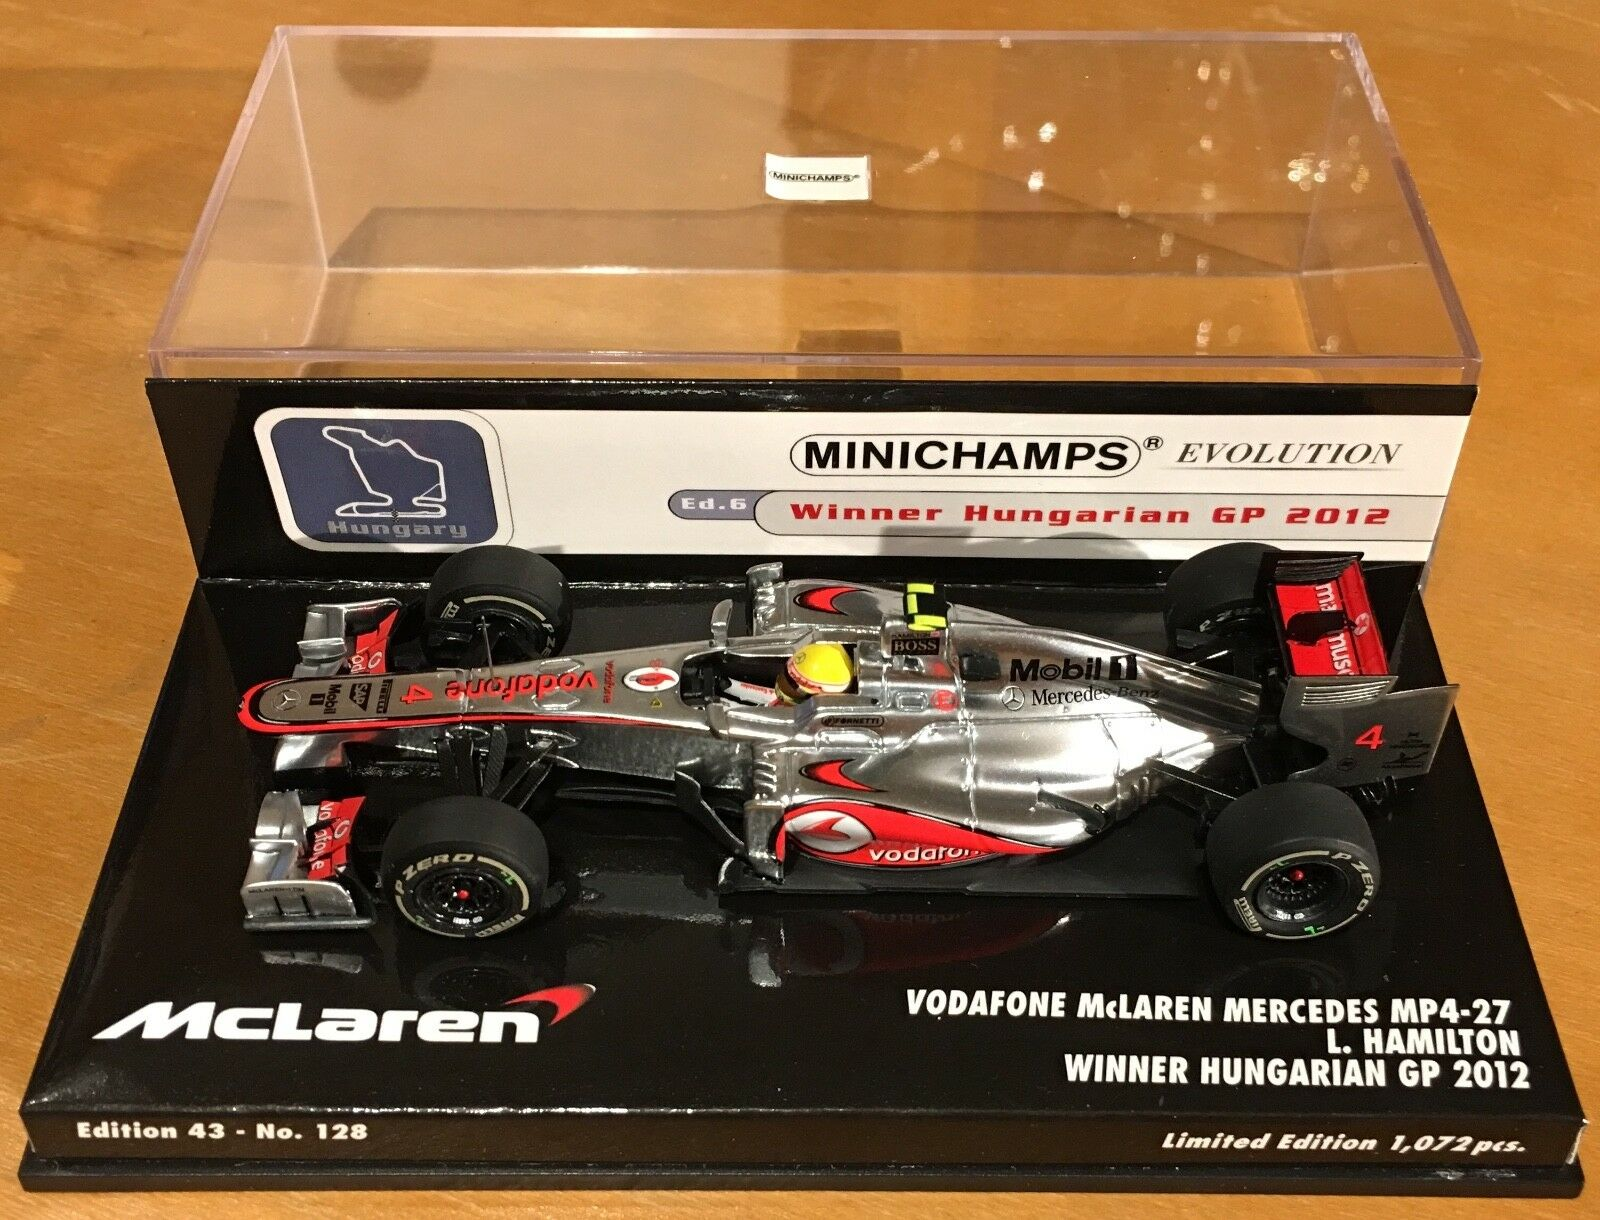 Minichamps 1 43 Vodaphone McLaren Mercedes MP4-27 Hamilton - 2012 Hungary Win